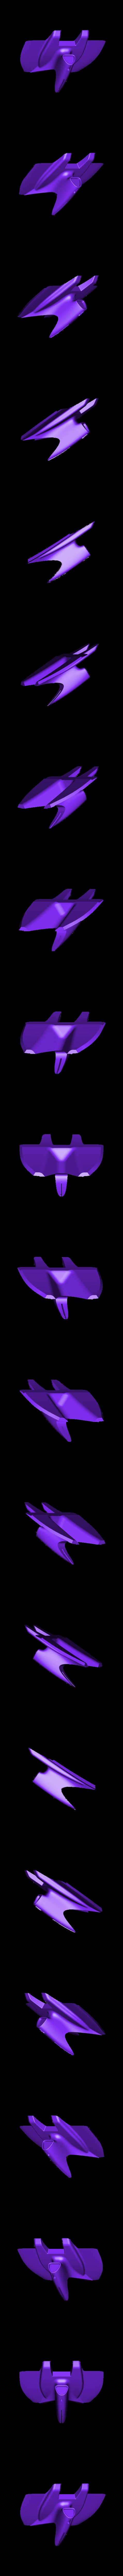 OpenRC_2017_MCL_Lid_Color2.stl Download free STL file OpenRC F1 Dual Color McLaren Edition • 3D printer model, DanielNoree